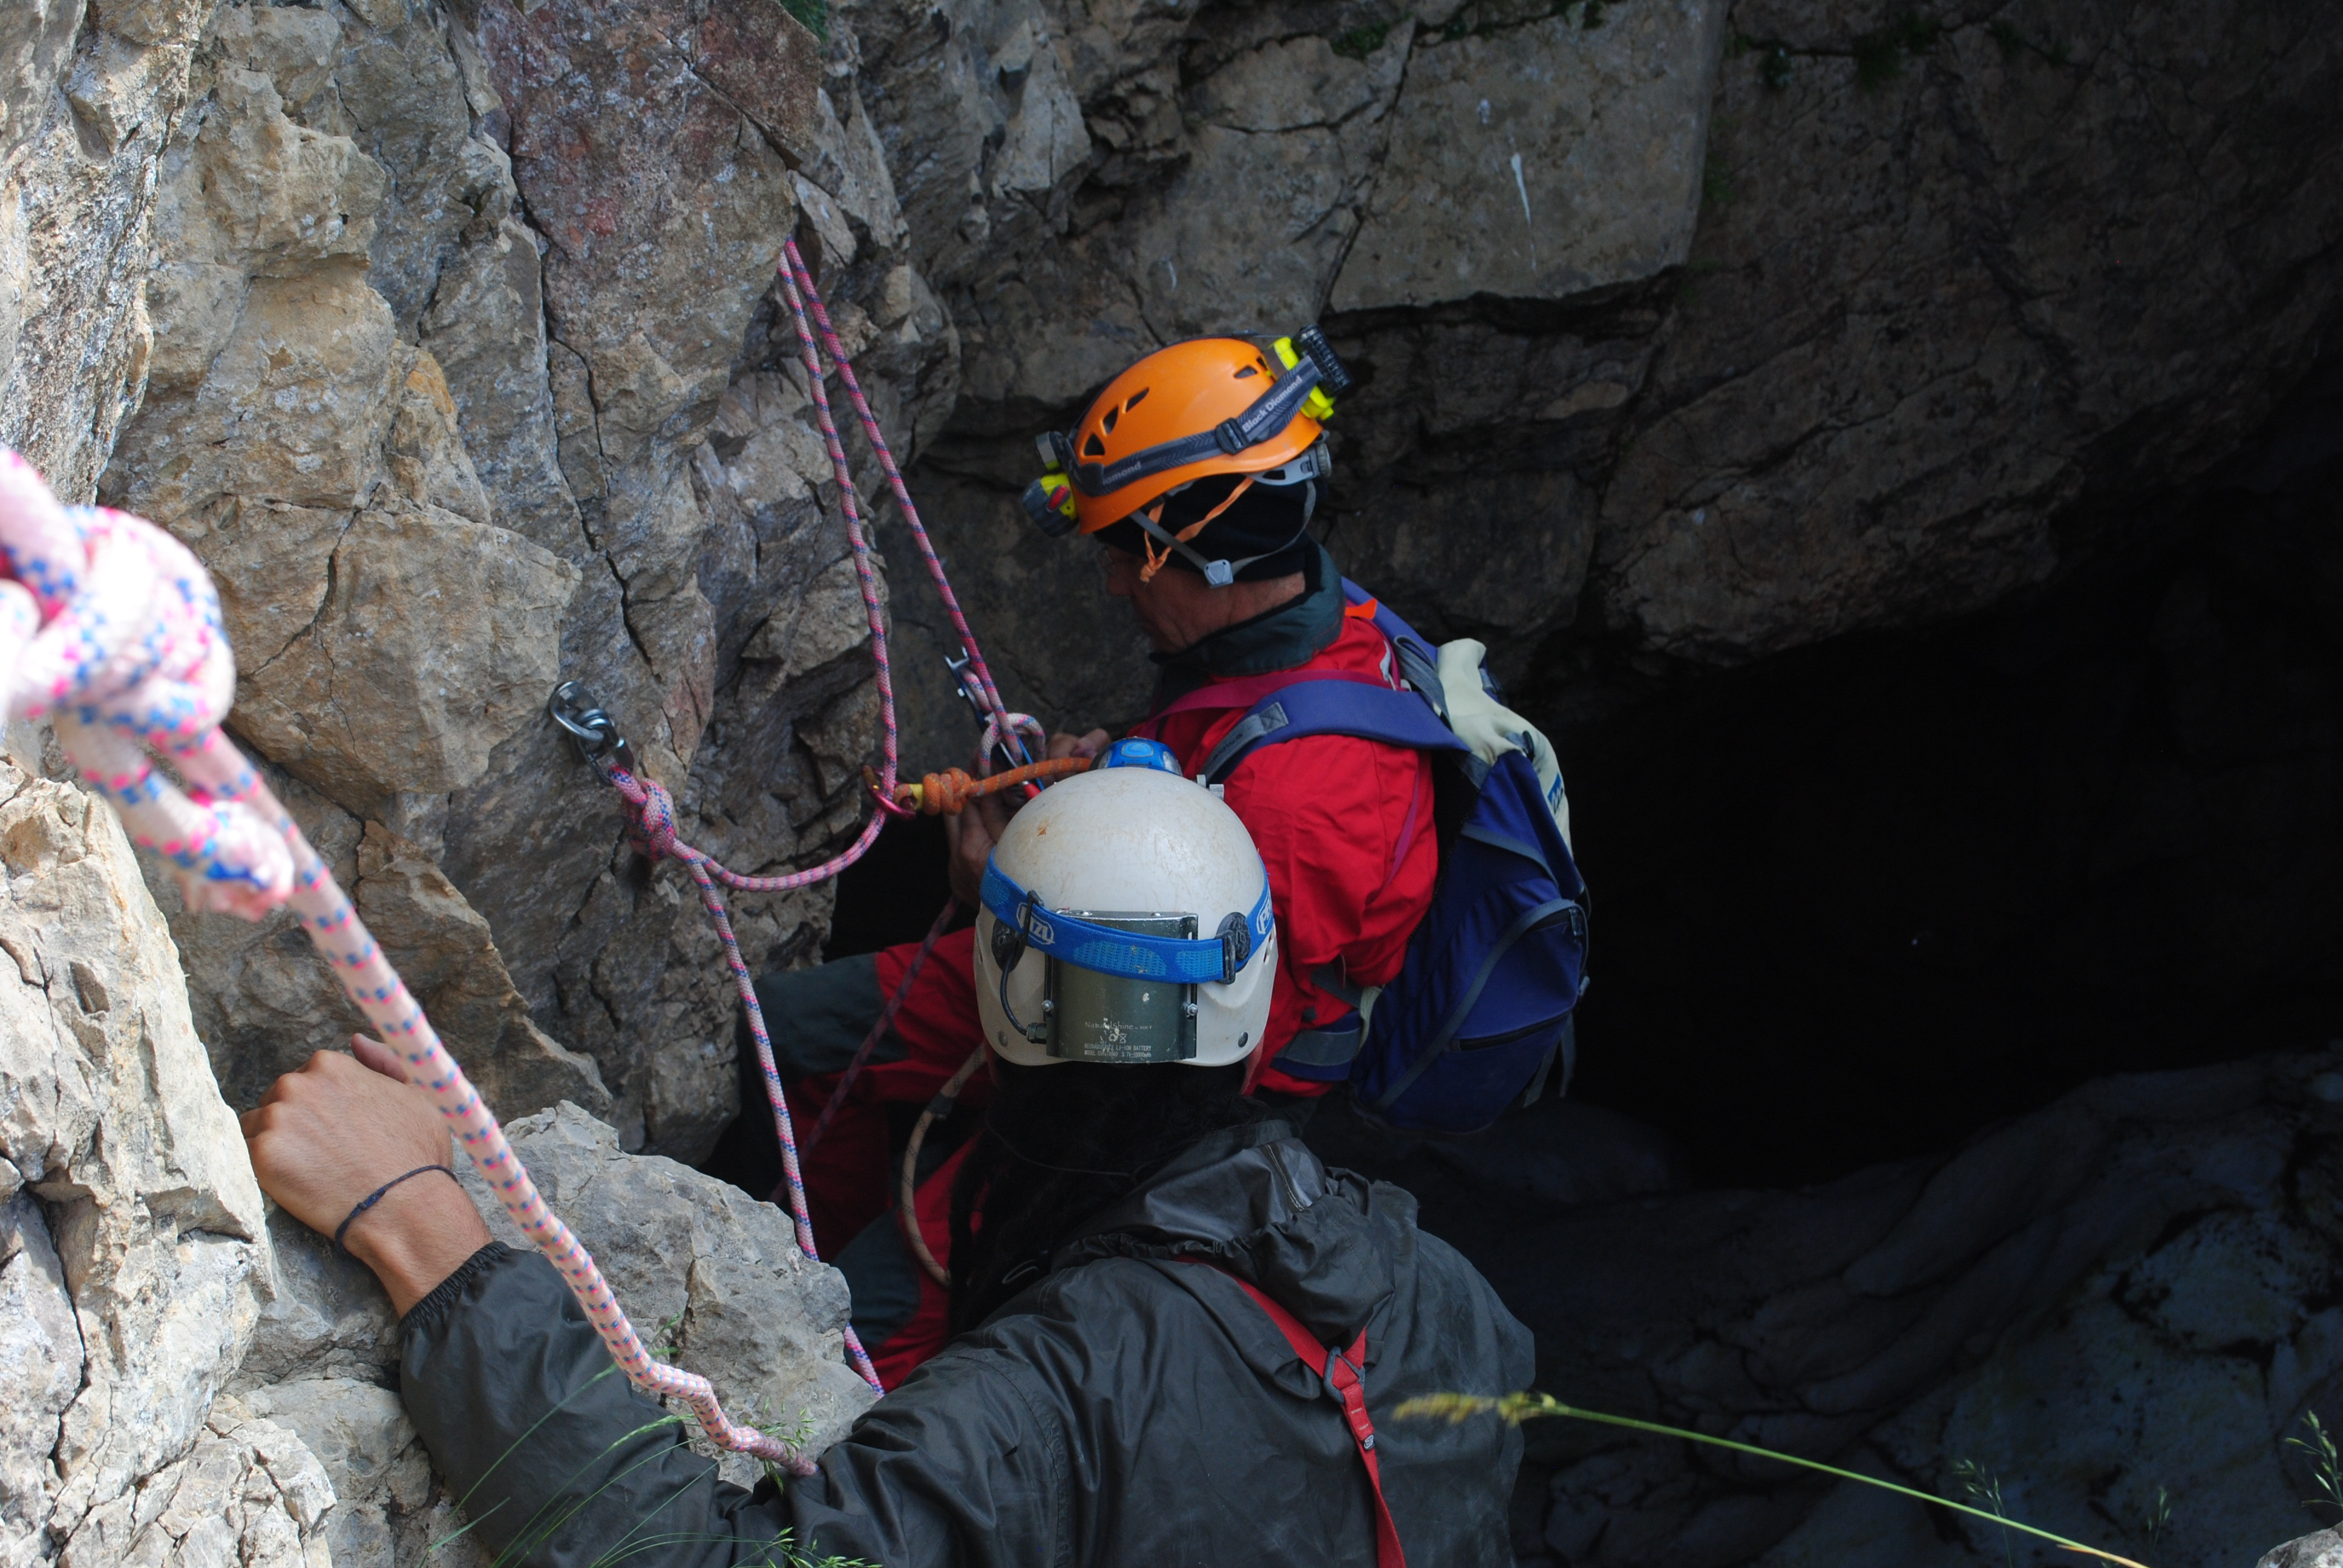 Maria Leunda Entrance to the cave